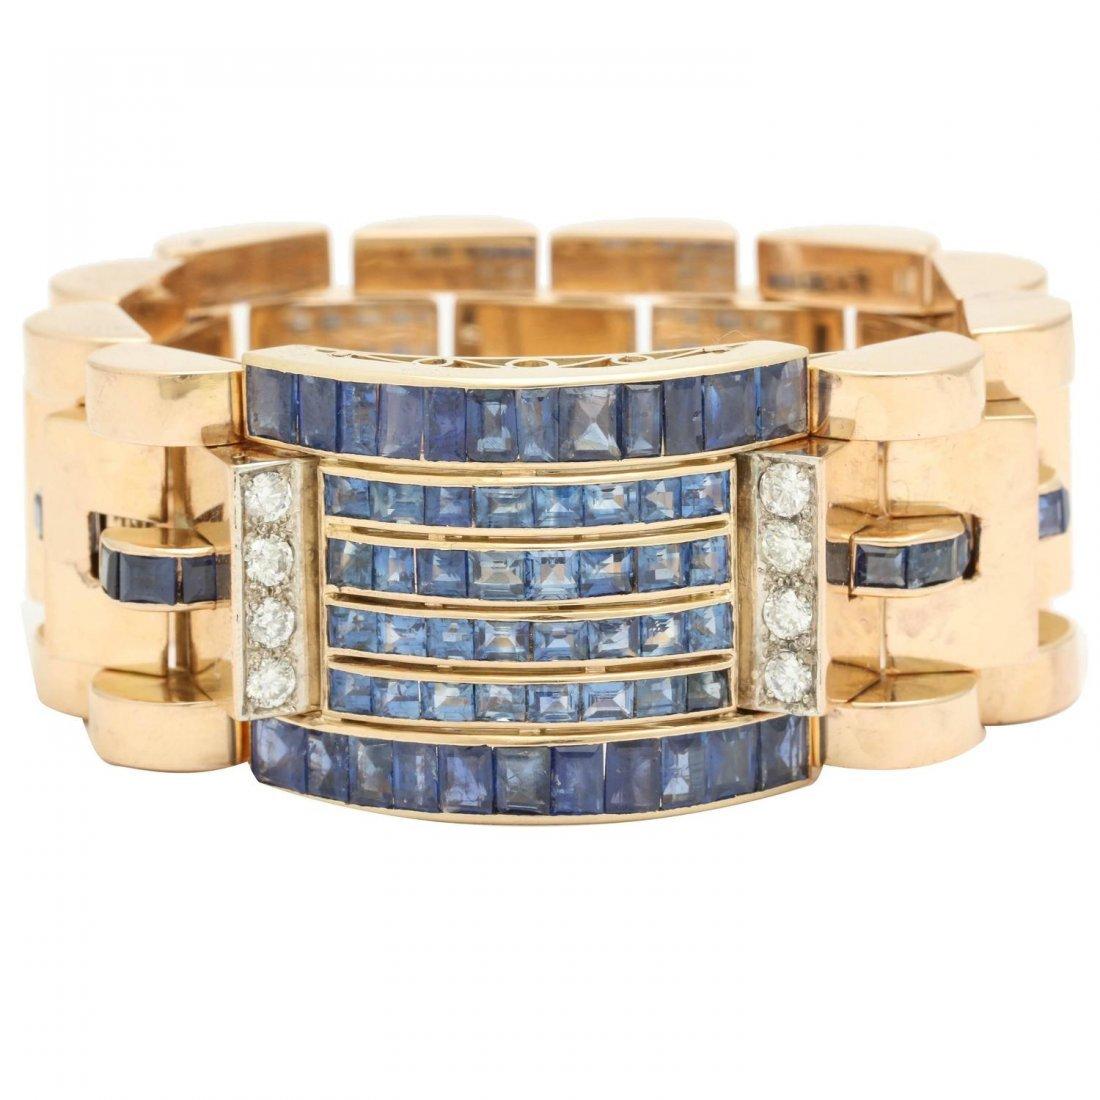 1940s Calibre Cut Sapphire Diamond Gold Flexible Link